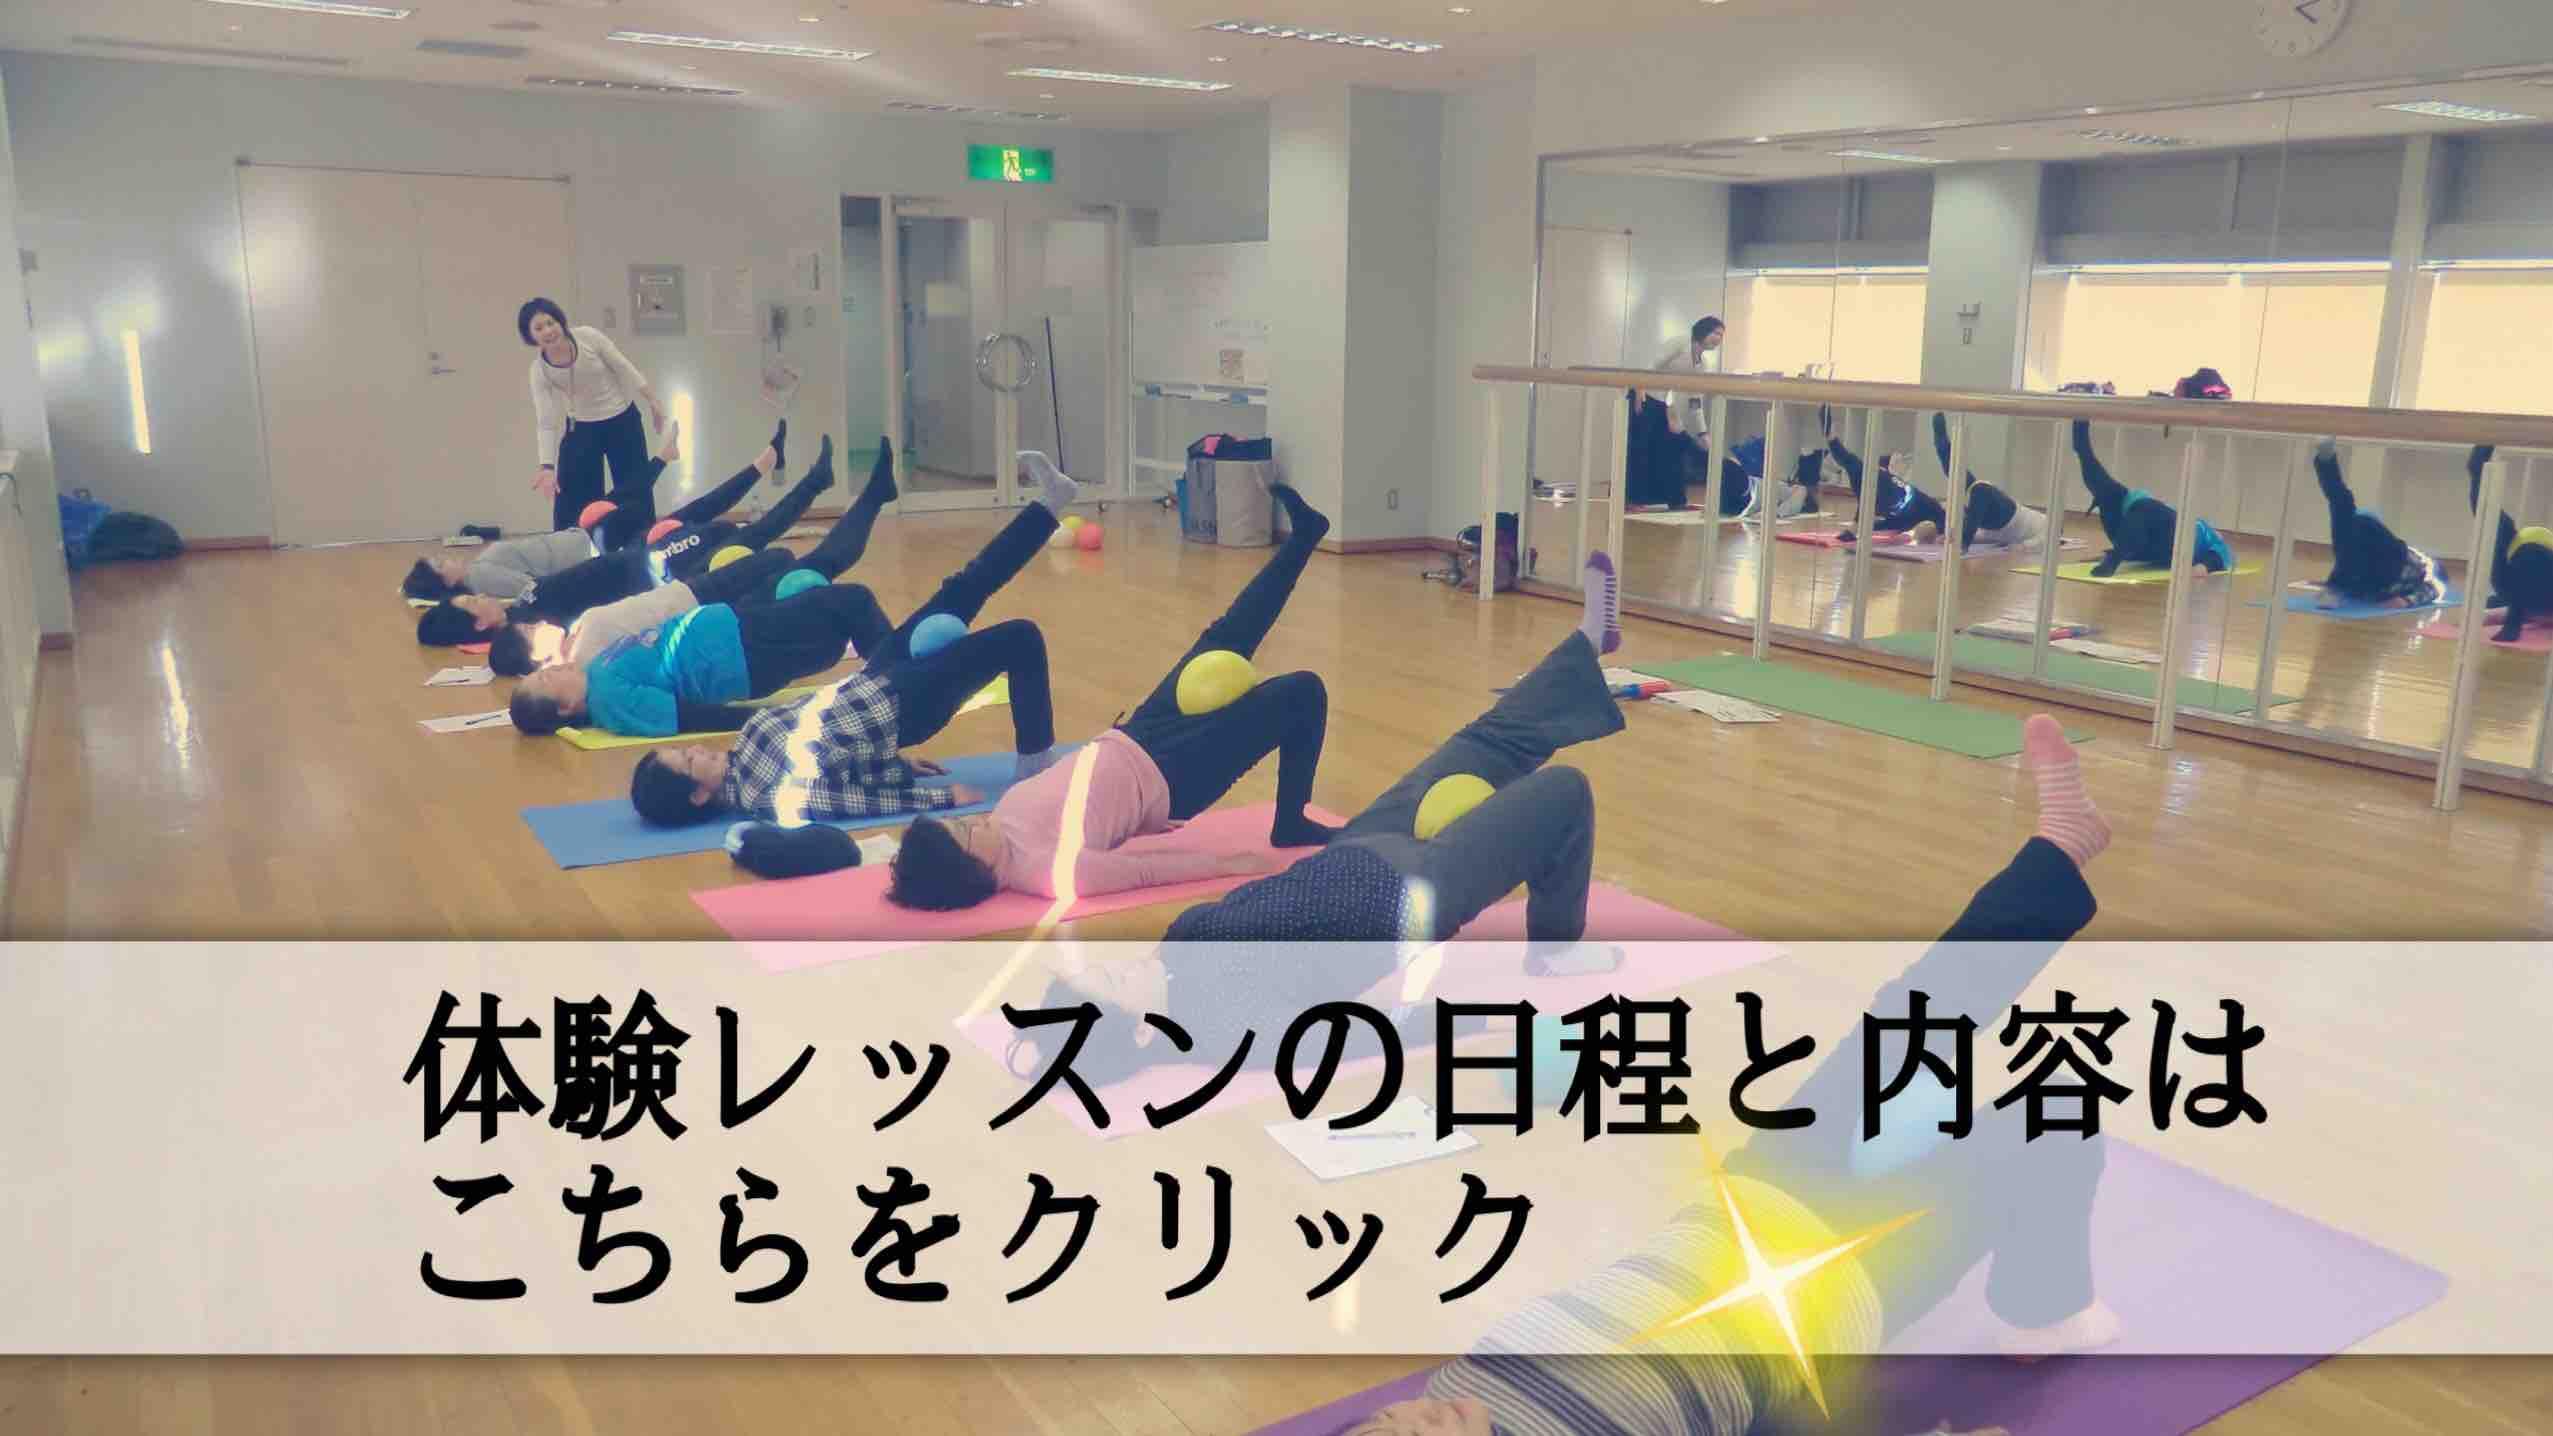 fc2blog_20170412181446537.jpg